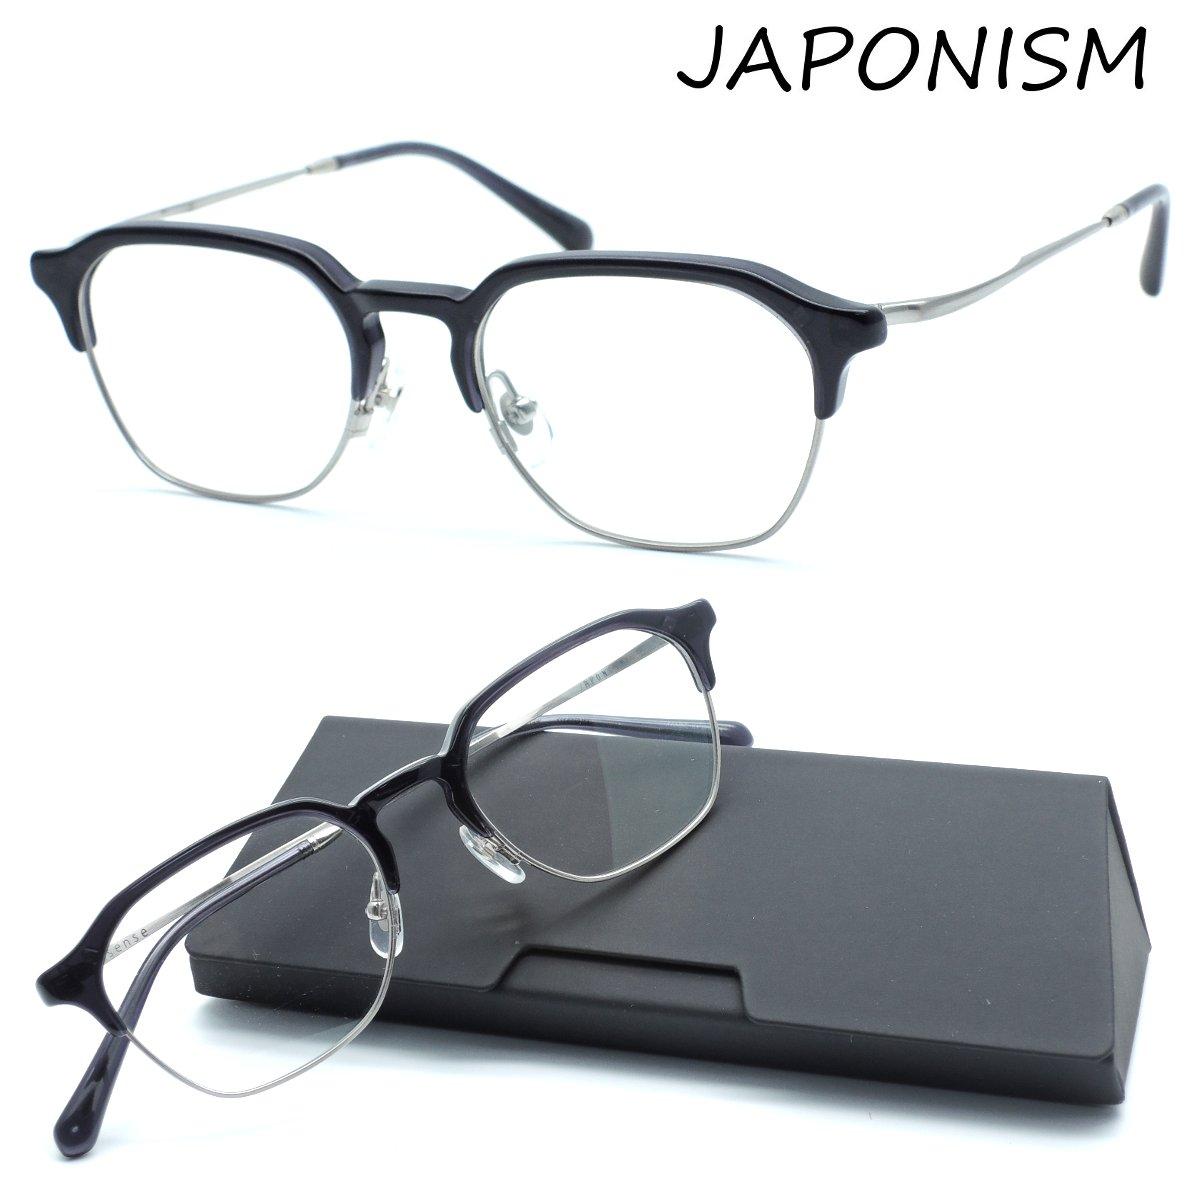 【JAPONISM】ジャポニズム メガネ JS-134 col.02 度付又は度無レンズ標準装備 MADE IN JAPAN【正規販売店品】【店内全品送料無料】